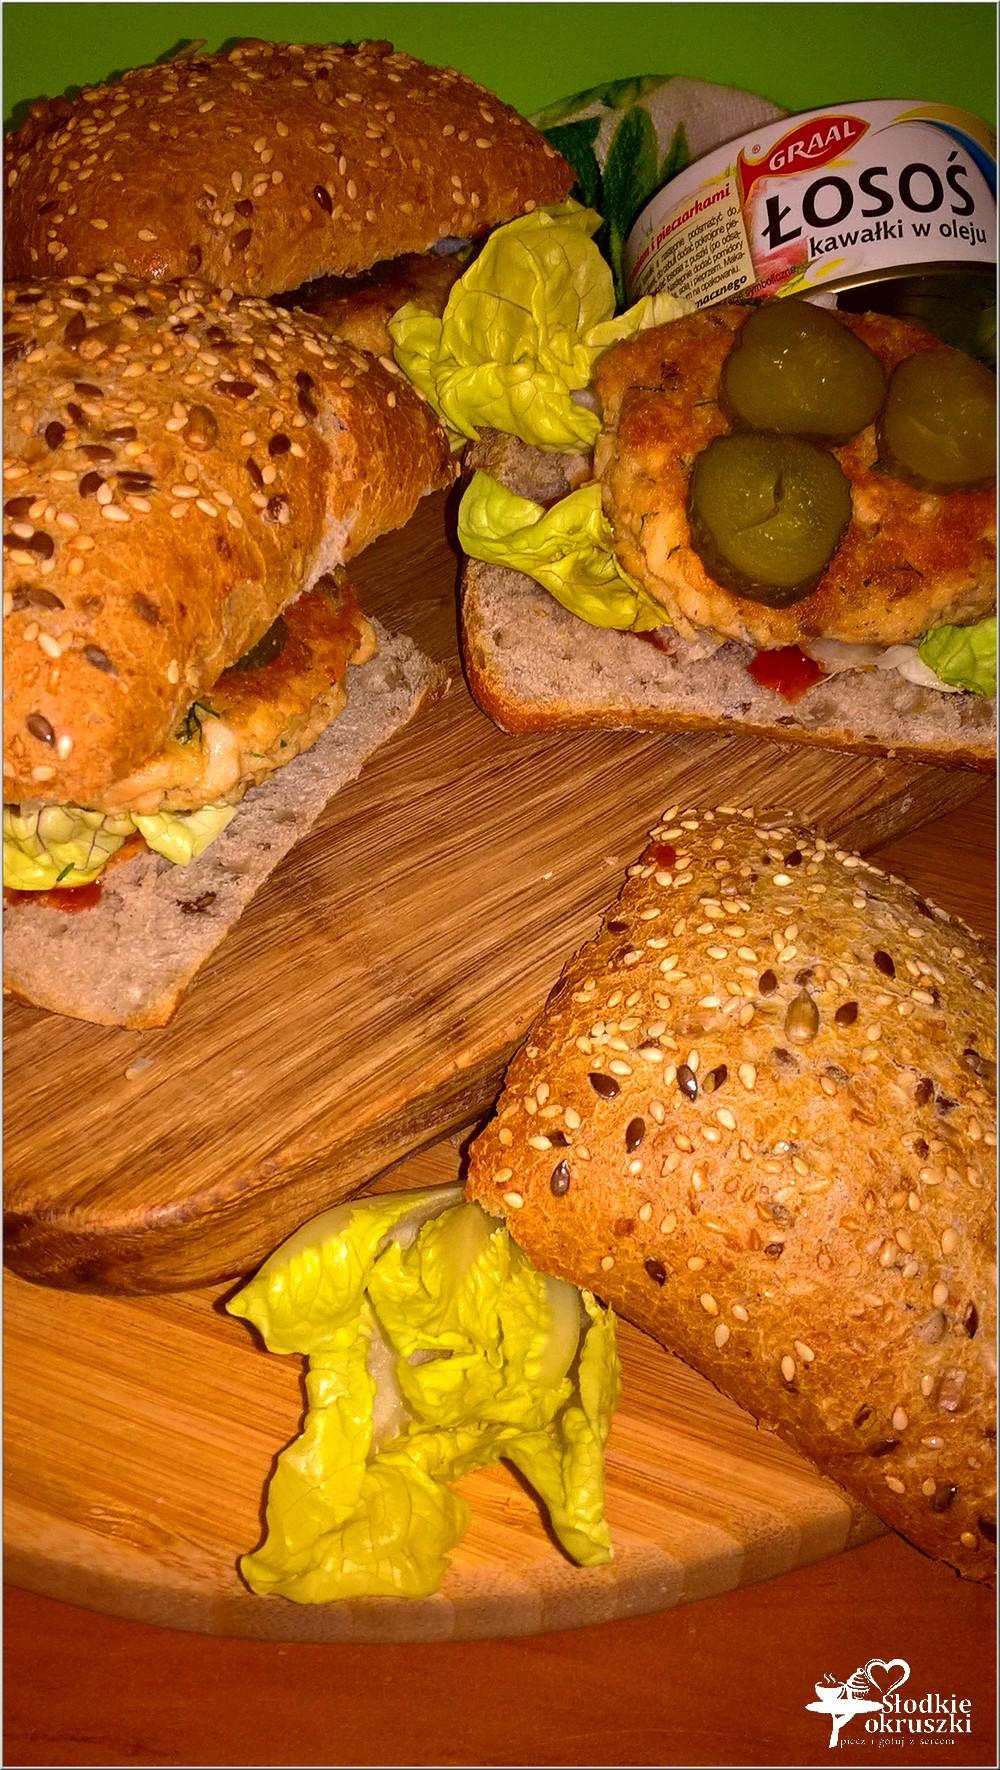 zdrowe-burgery-rybne-z-kotletem-z-lososia-8